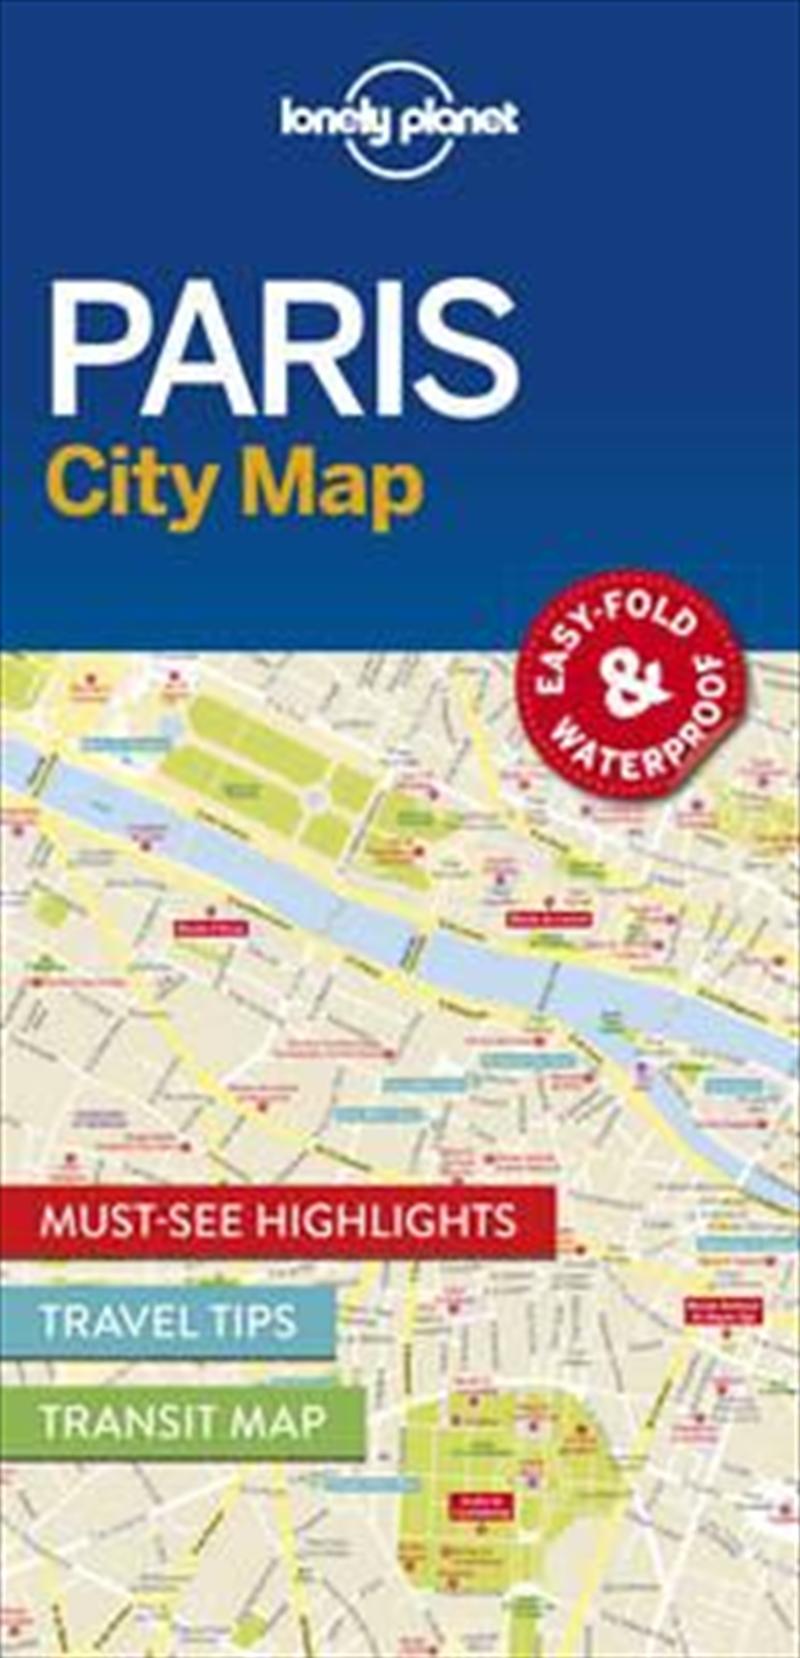 Paris City Map: Edition 1 | Sheet Map